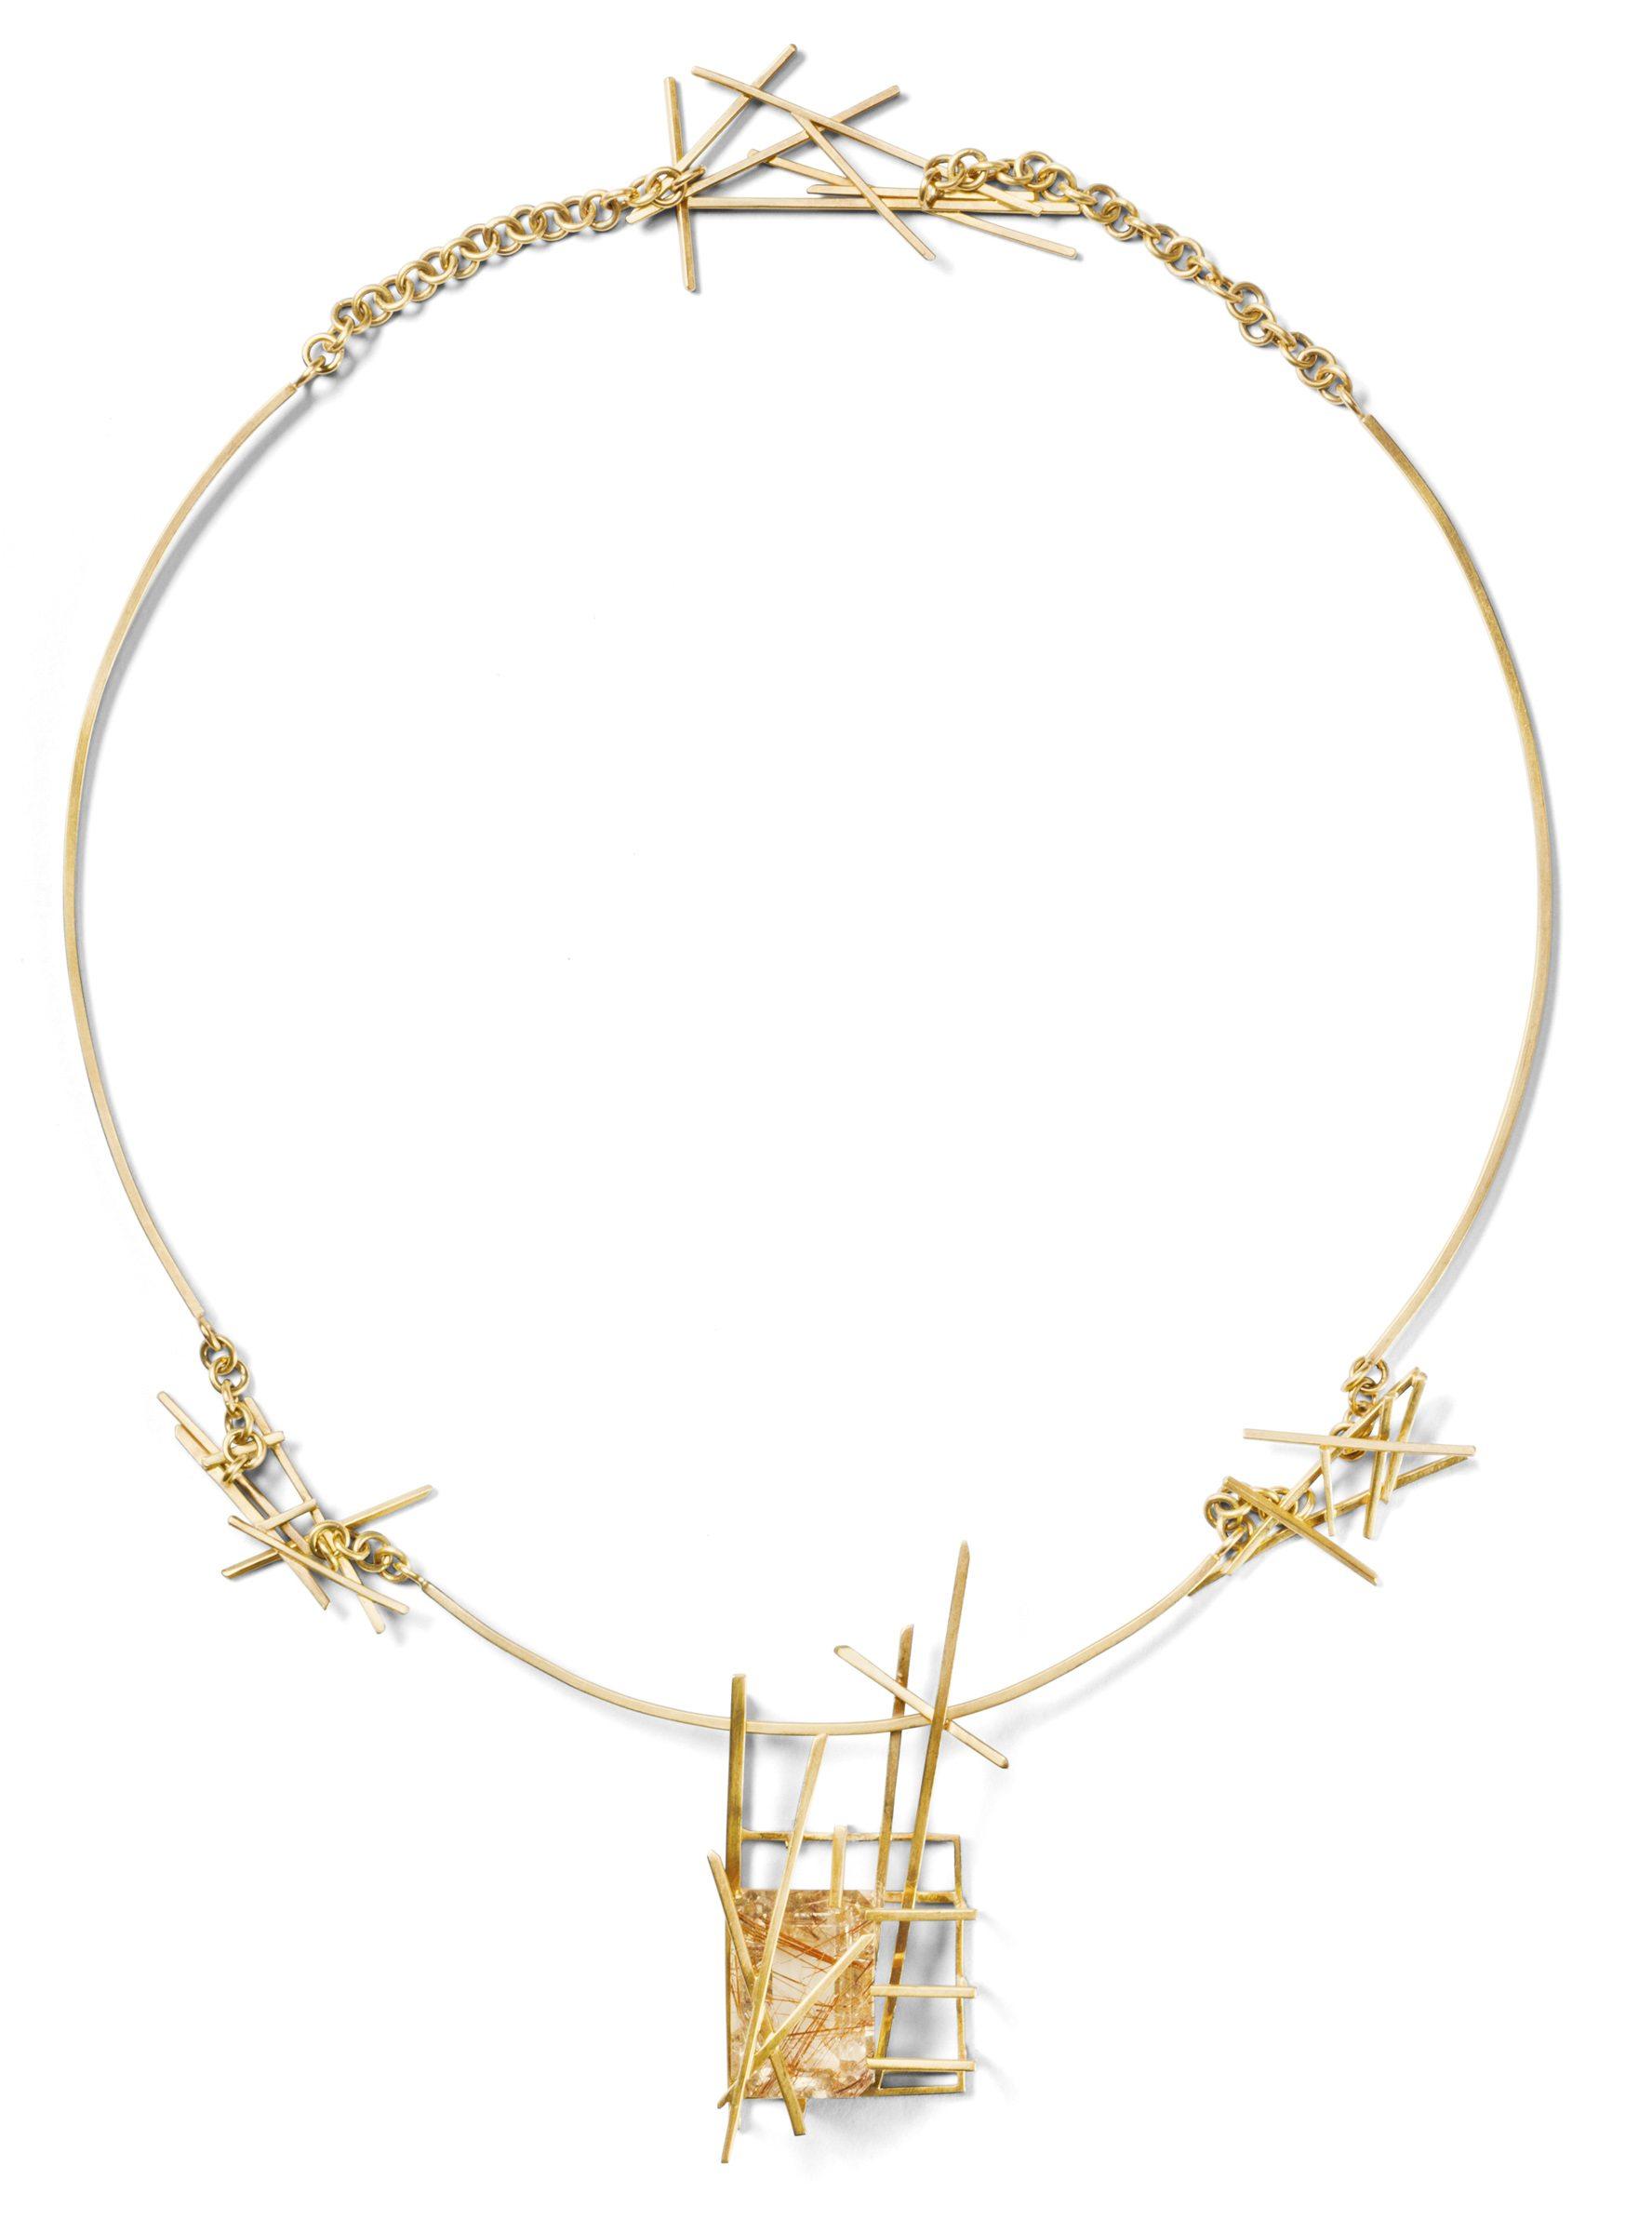 Rutilated quartz necklace in 10k yellow gold $3250 by Sin Kim, Sin Kim Jewellery